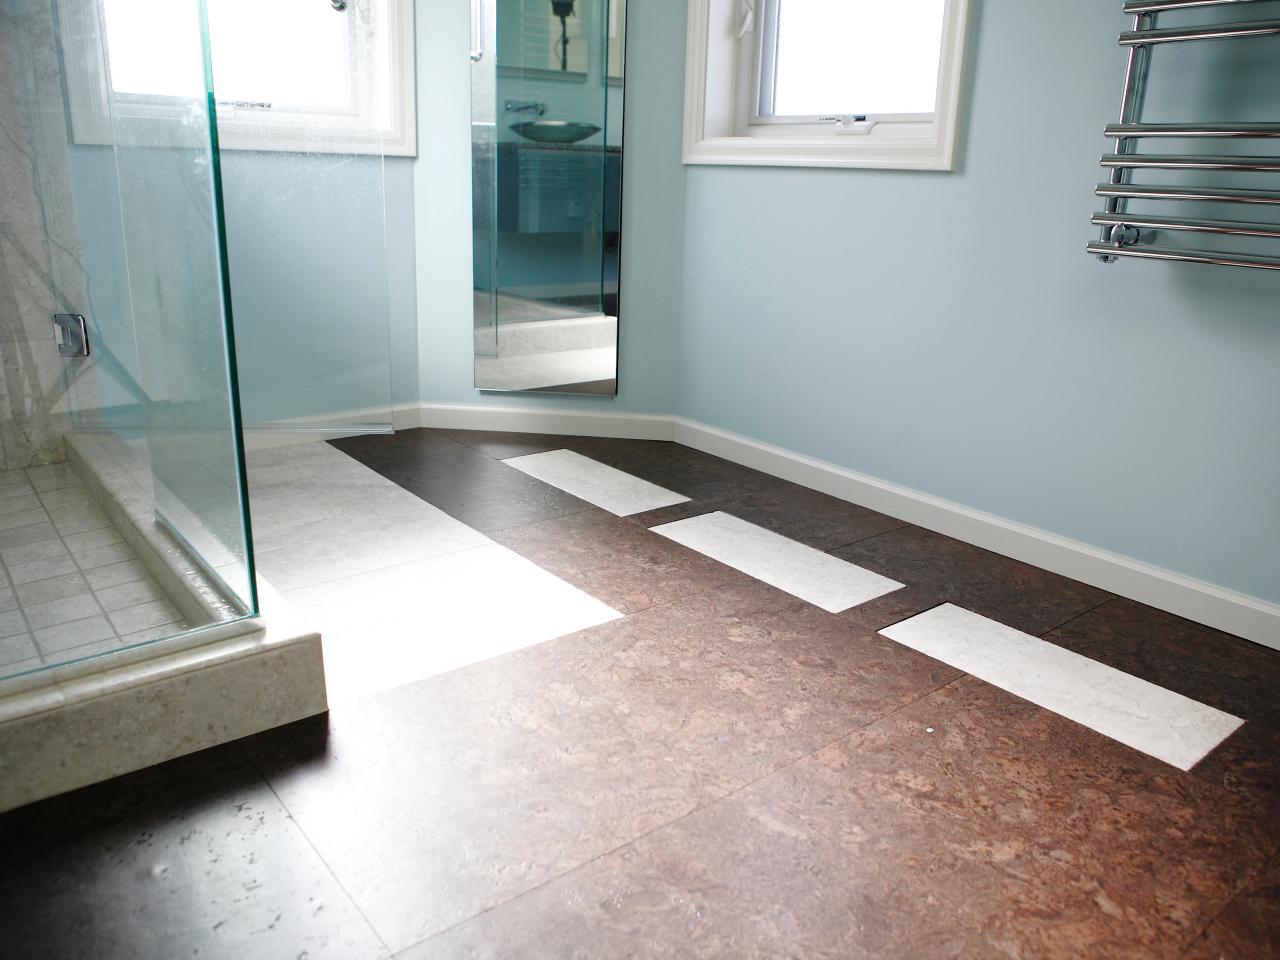 DBCR207_flooring_s4x3.jpg.rend.hgtvcom.1280.960